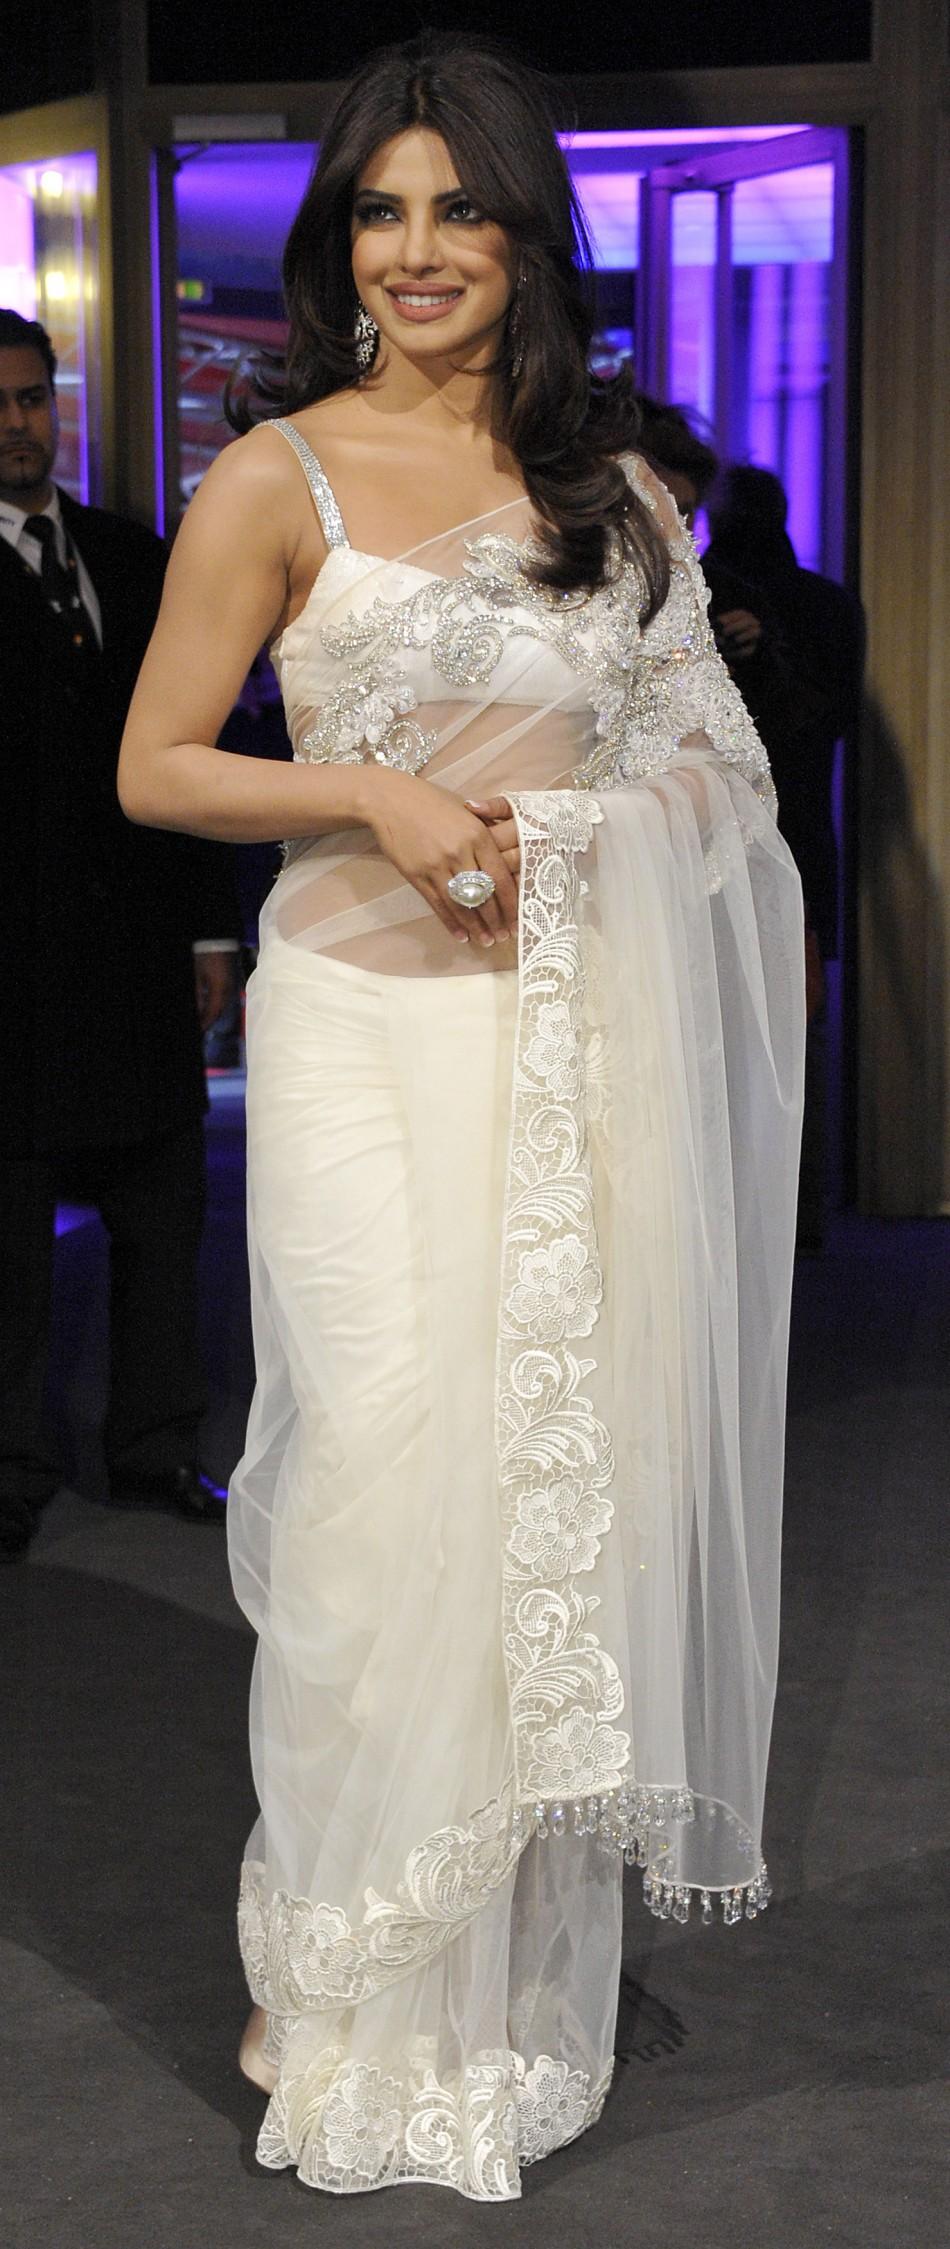 Grammys 2012 Priyanka Chopra To Attend, Sizzling Looks Of -9351